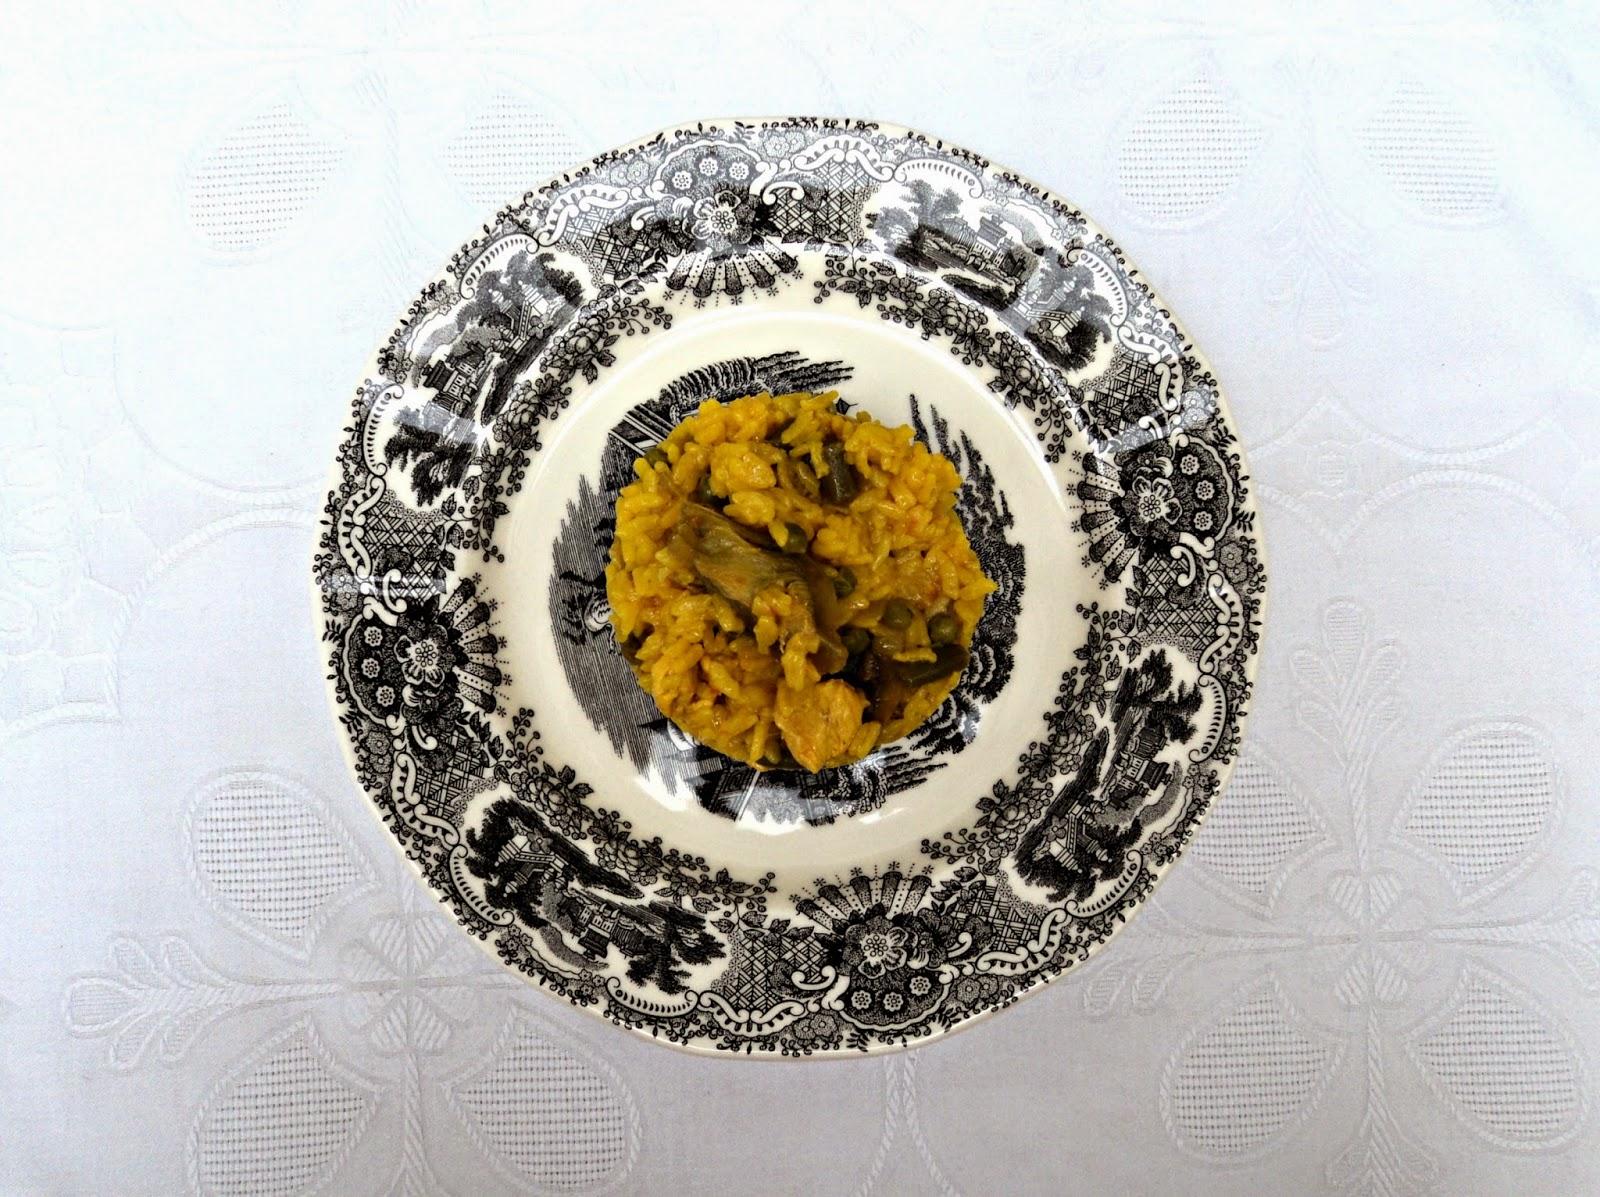 arroz-verduras-pollo-presentacion